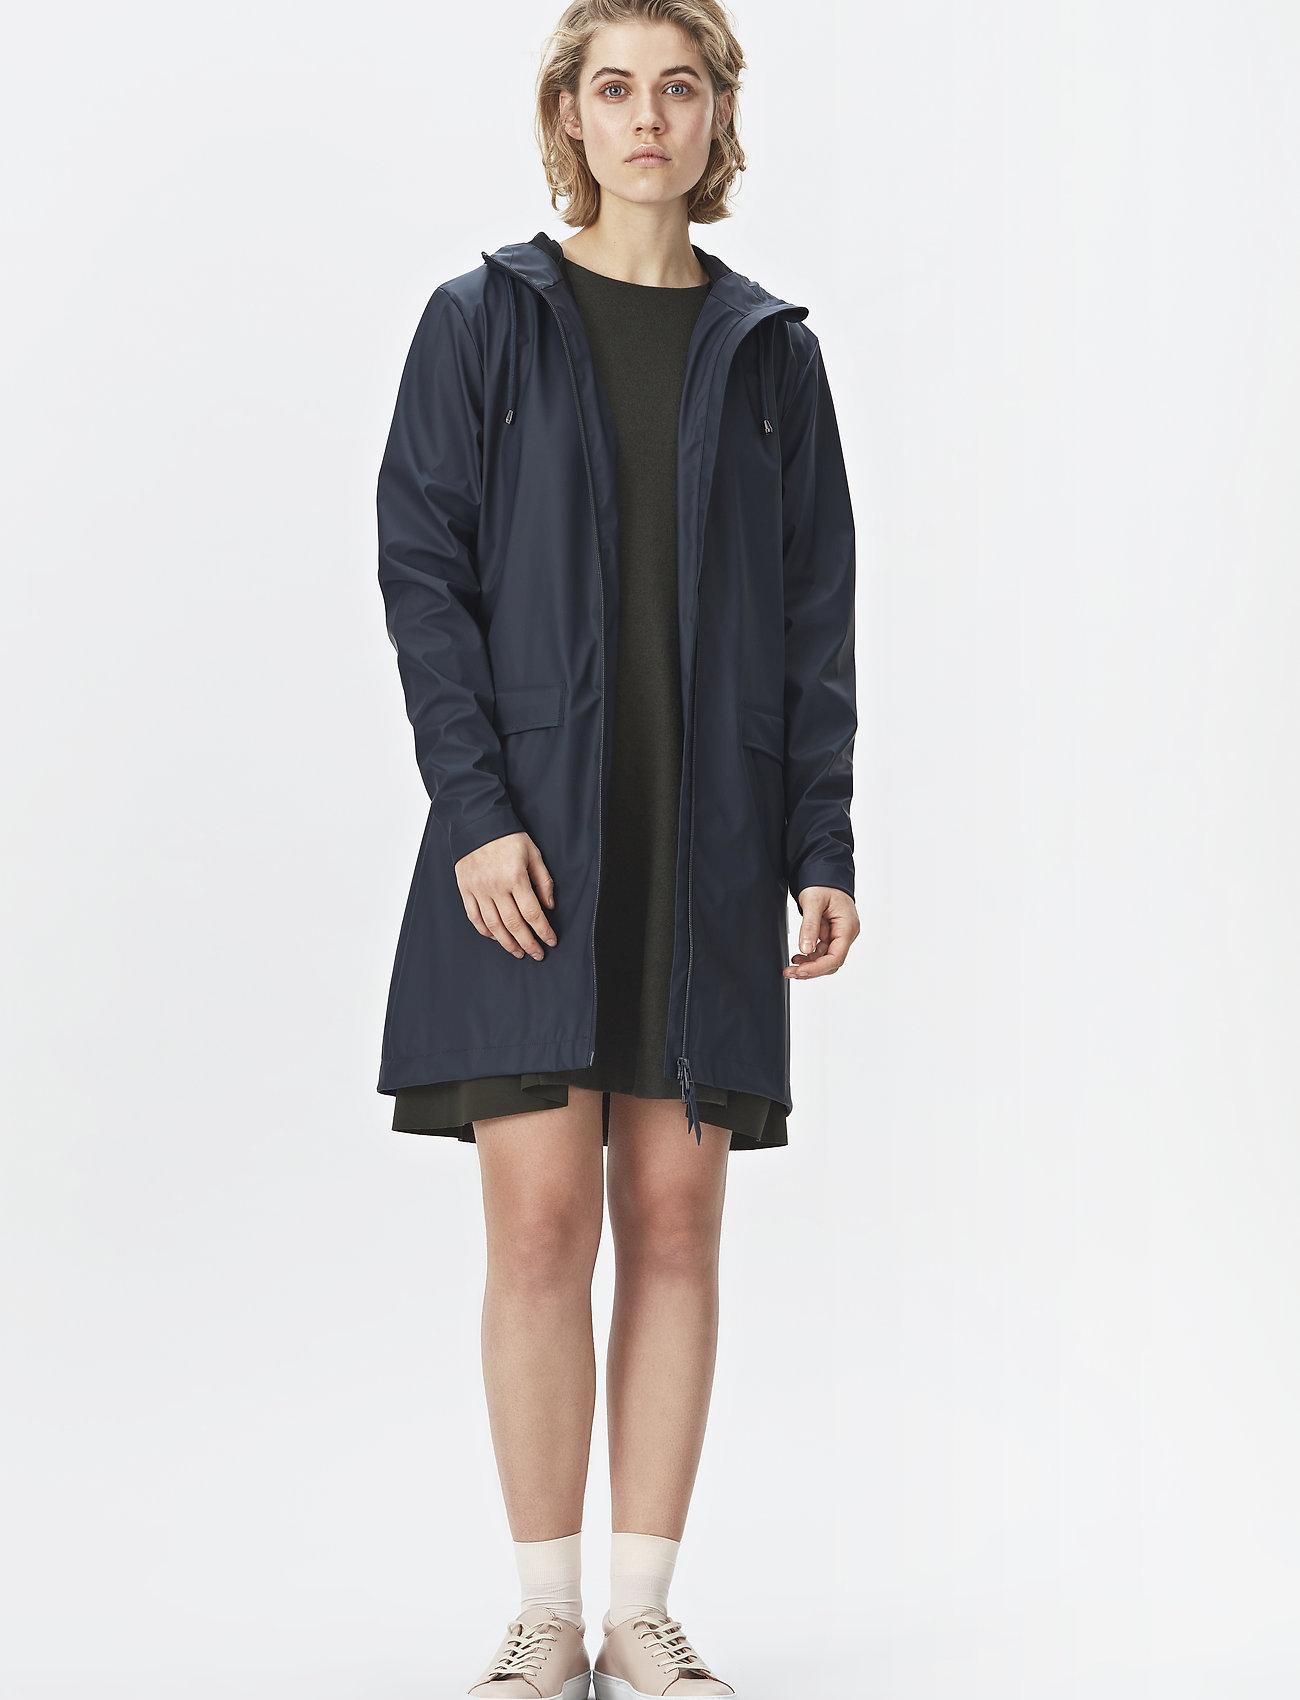 Rains - W Coat - regenbekleidung - 01 black - 0